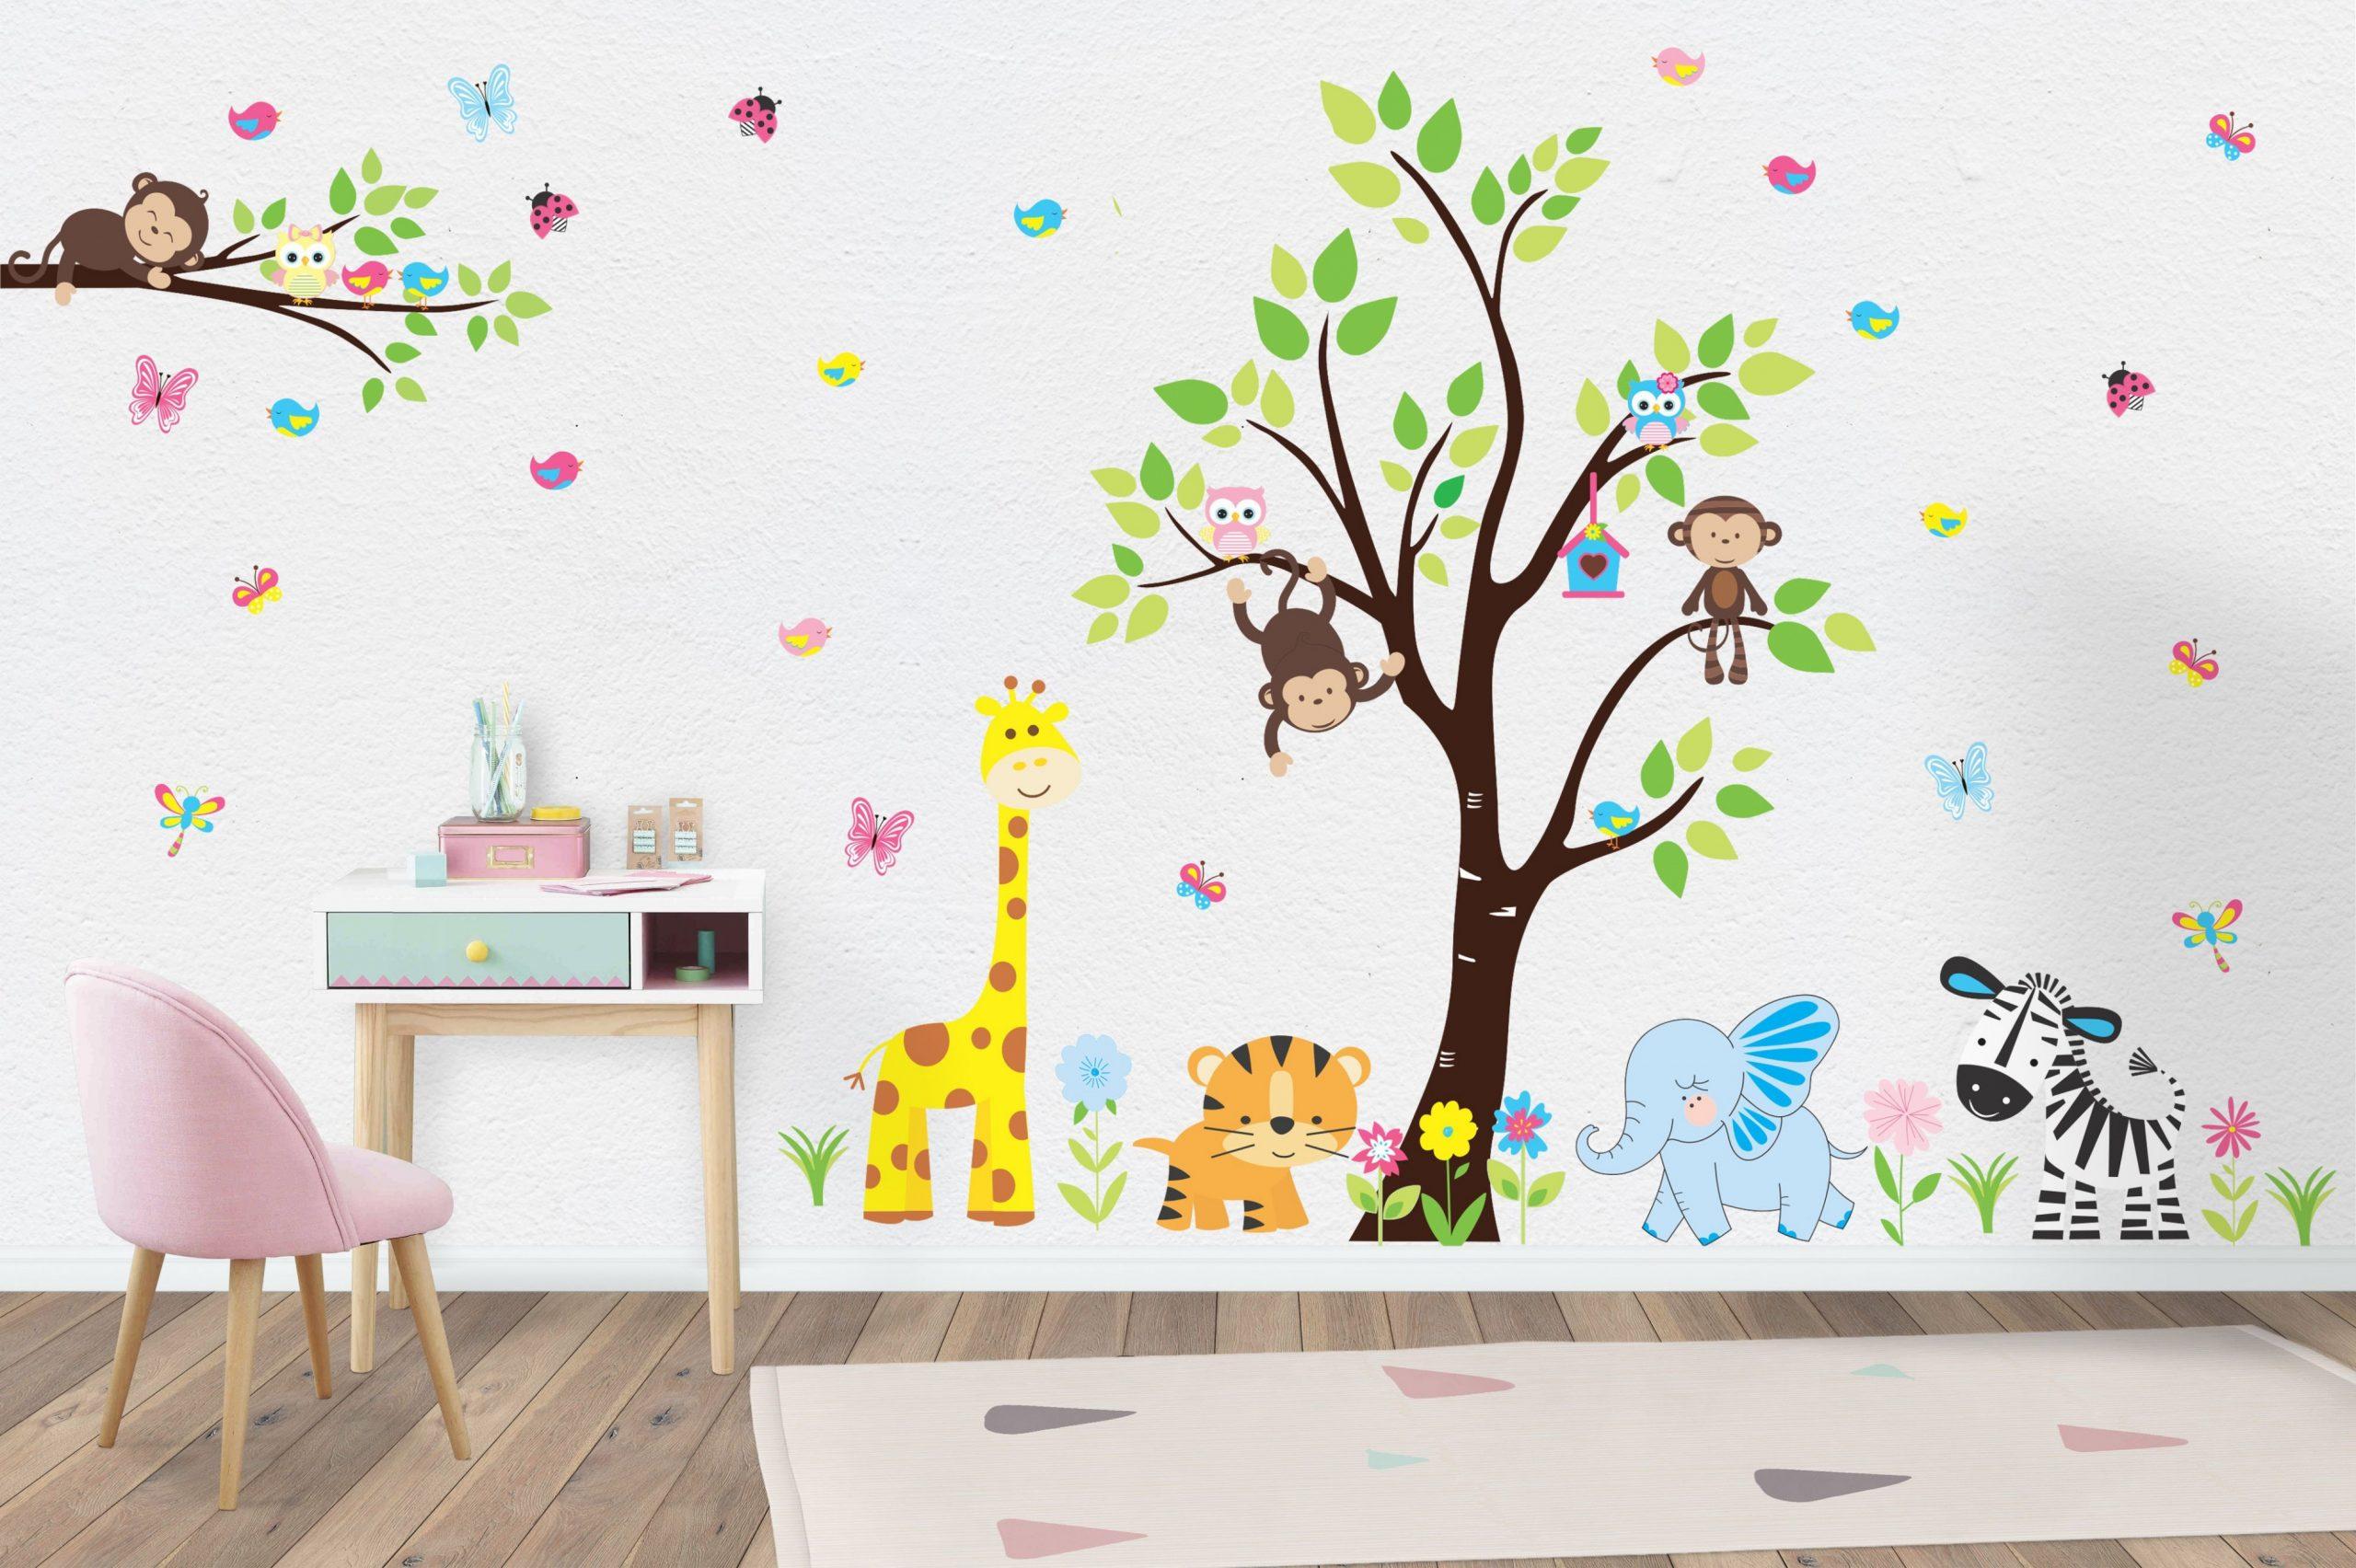 Wall Decals Nursery  Safari Animal Stickers  Jungle Animal  - Baby Room Wall Decals